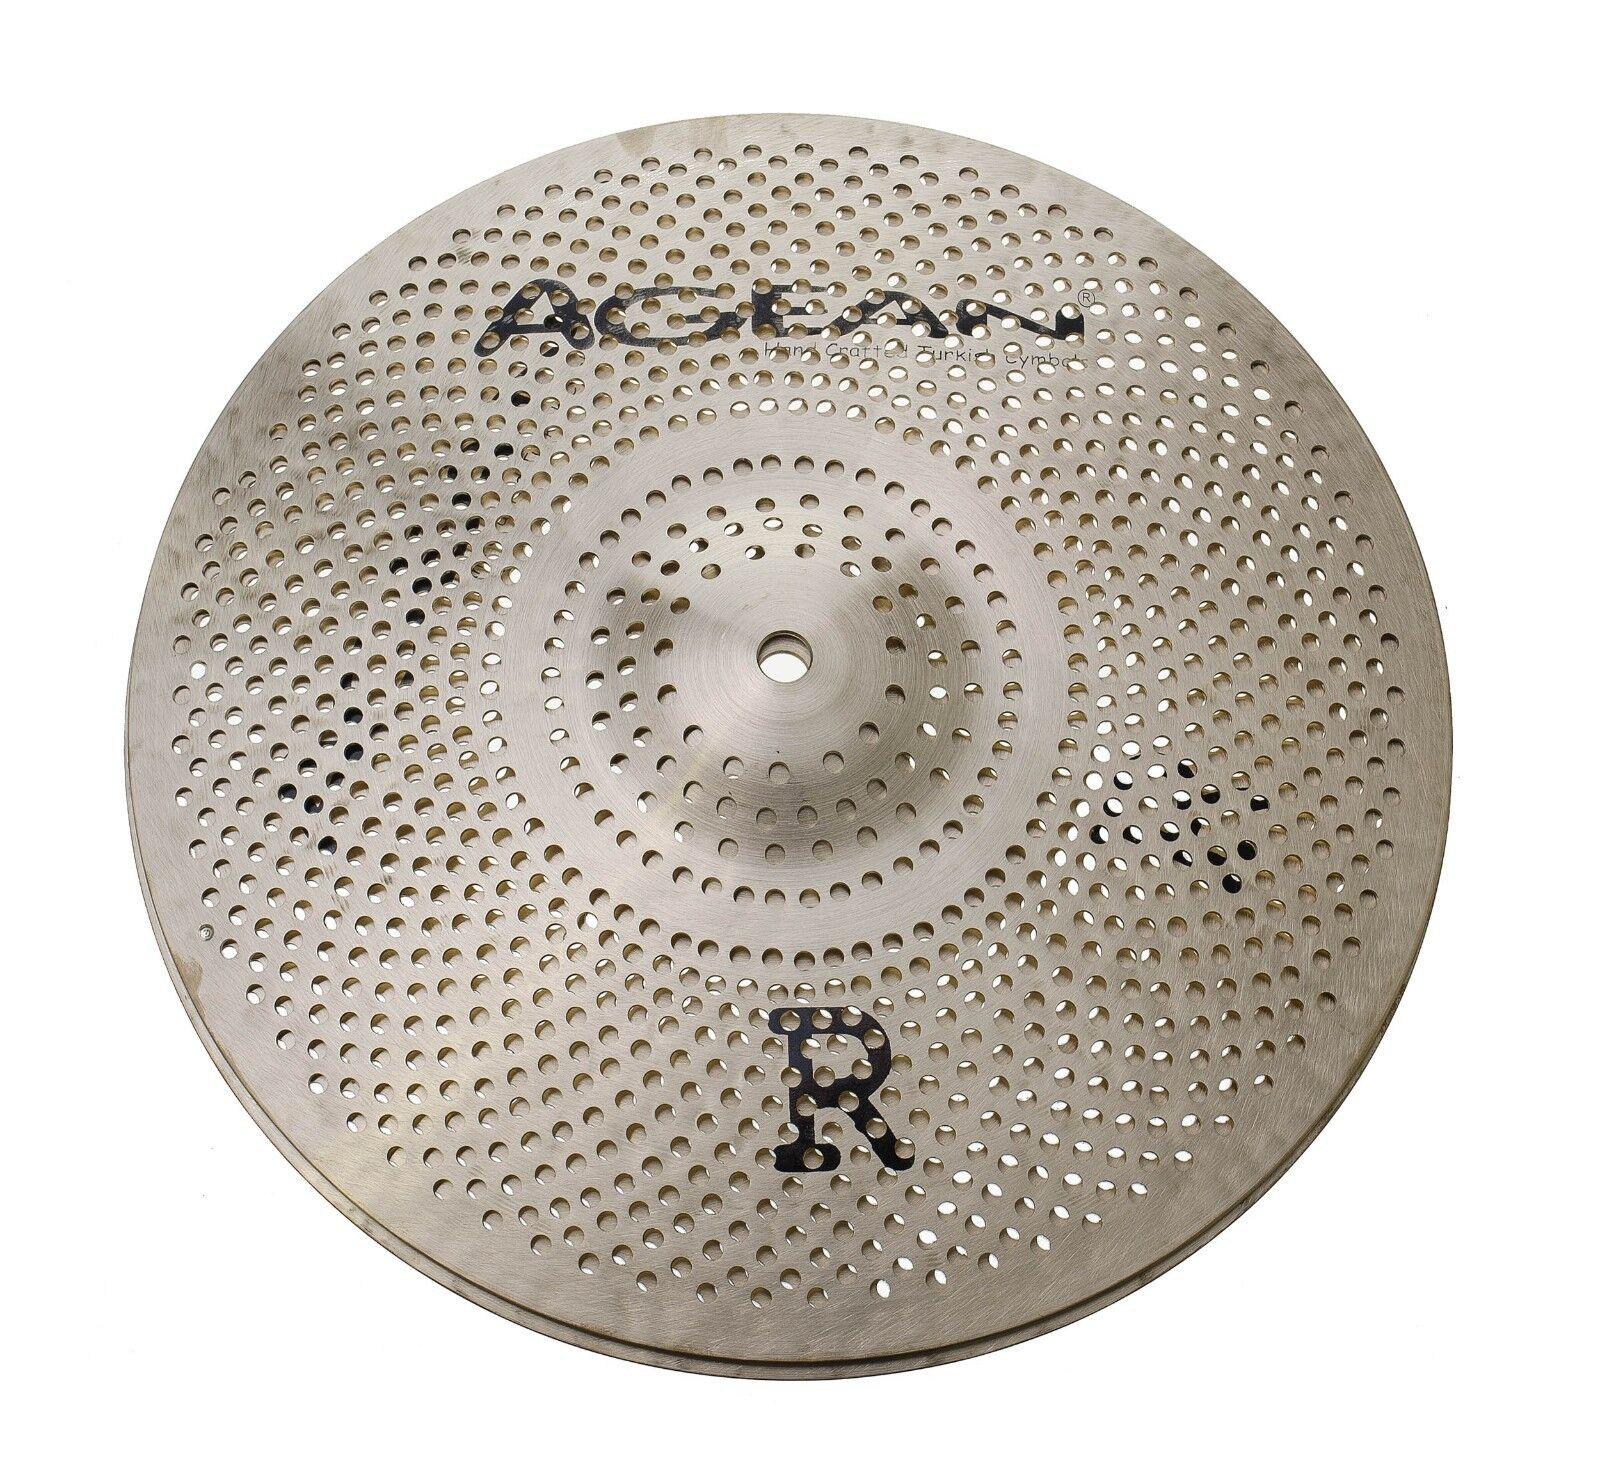 Agean Cymbals R Serie 13-Zoll Low Volume Hi-Hat